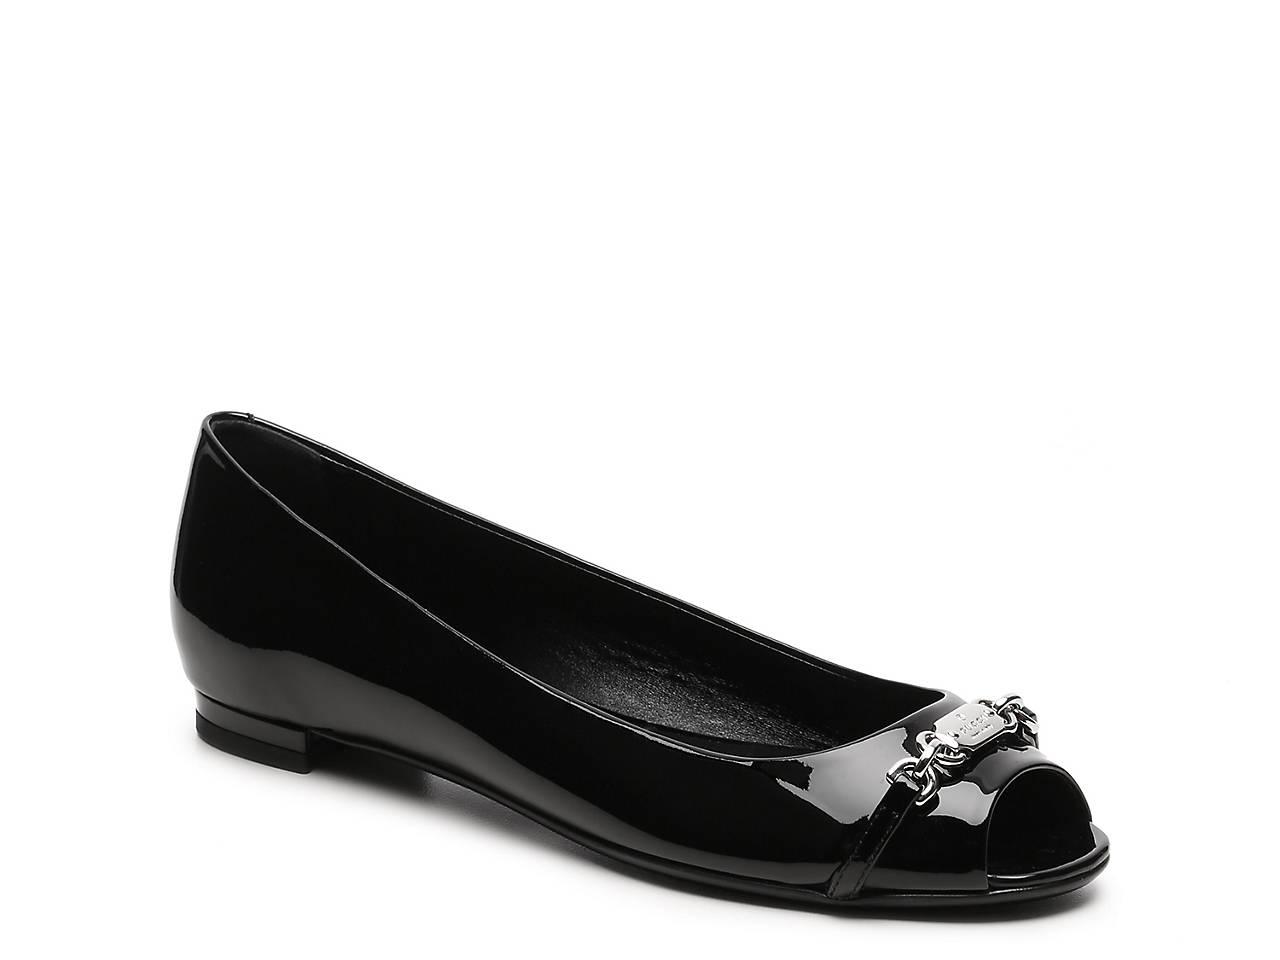 5bdec1fe69c5 Gucci - Fragrance Final Sale - Leather Nameplate Flat Men s Shoes